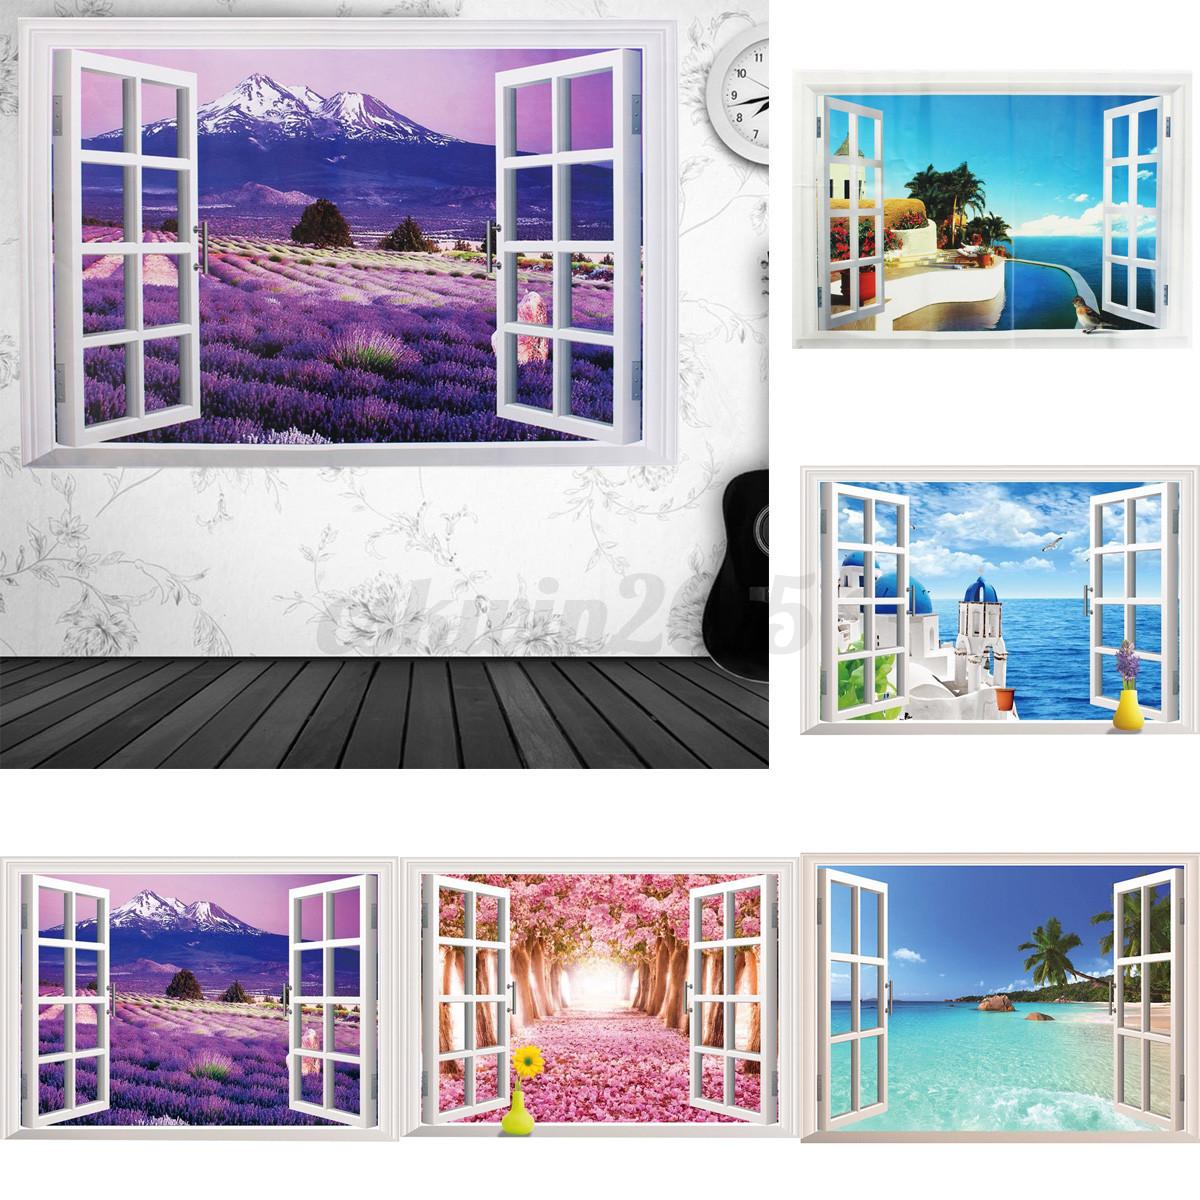 3d ocean beach window wall sticker decals room decor vinyl for Beach mural curtains